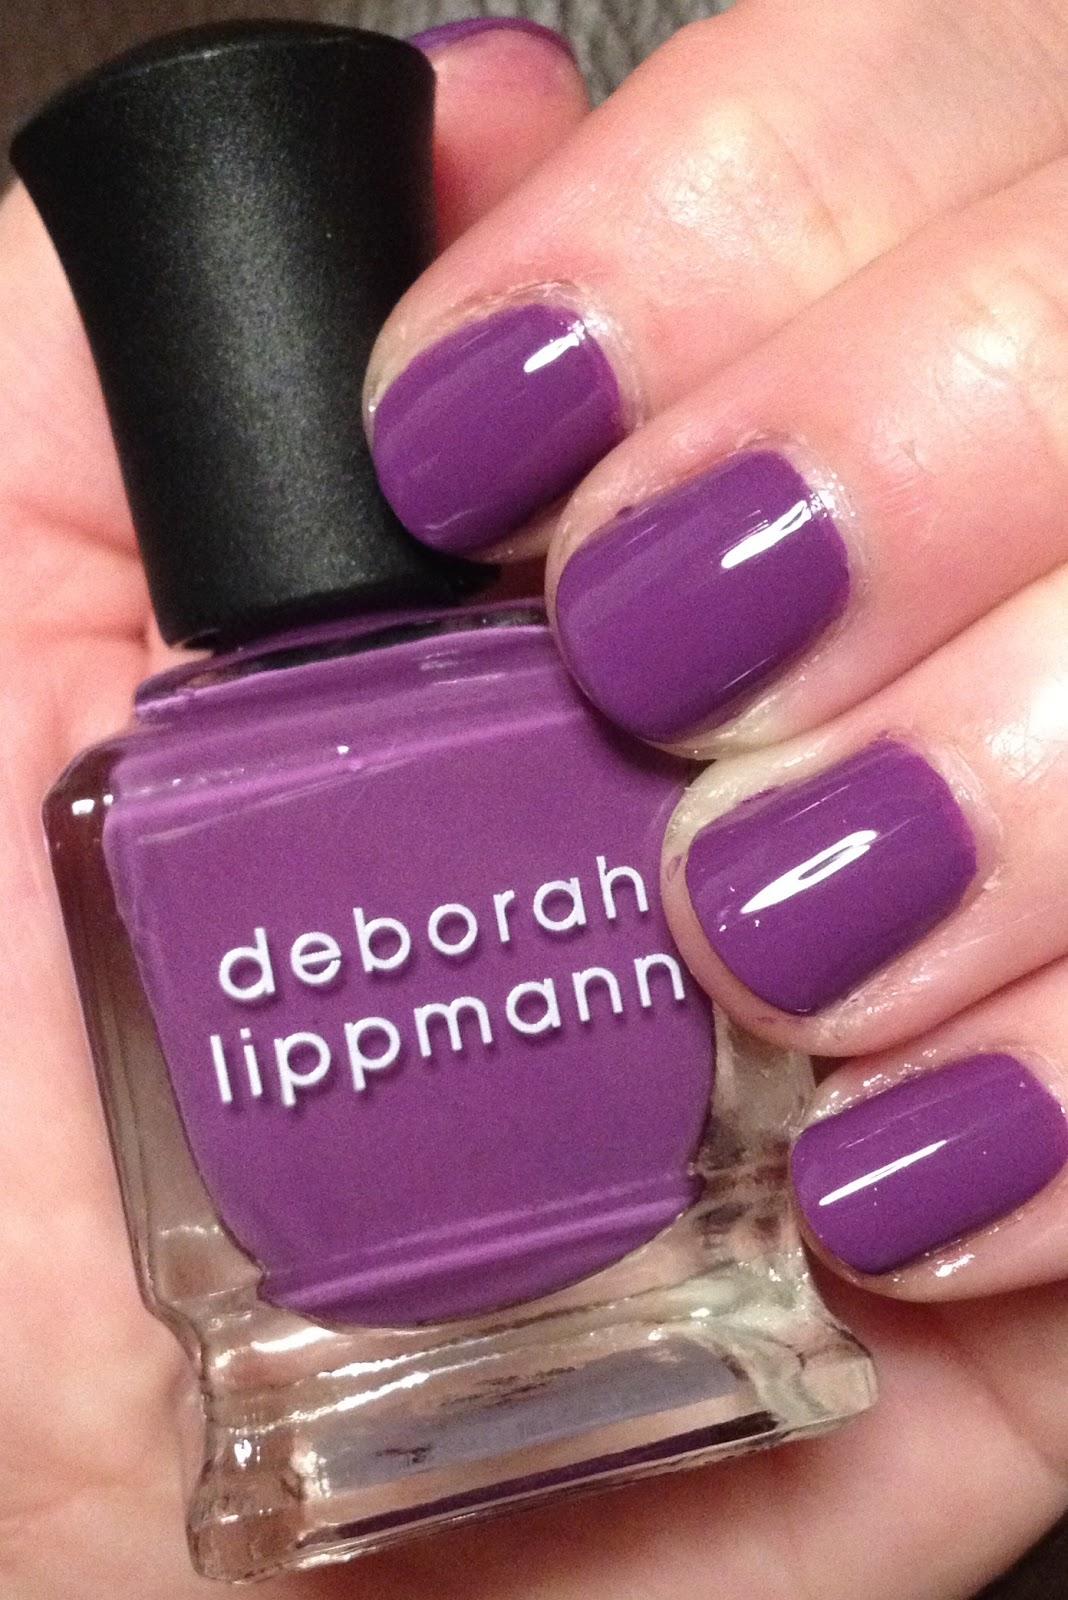 The Beauty of Life: #ManiMonday: Deborah Lippmann Maniac from the ...